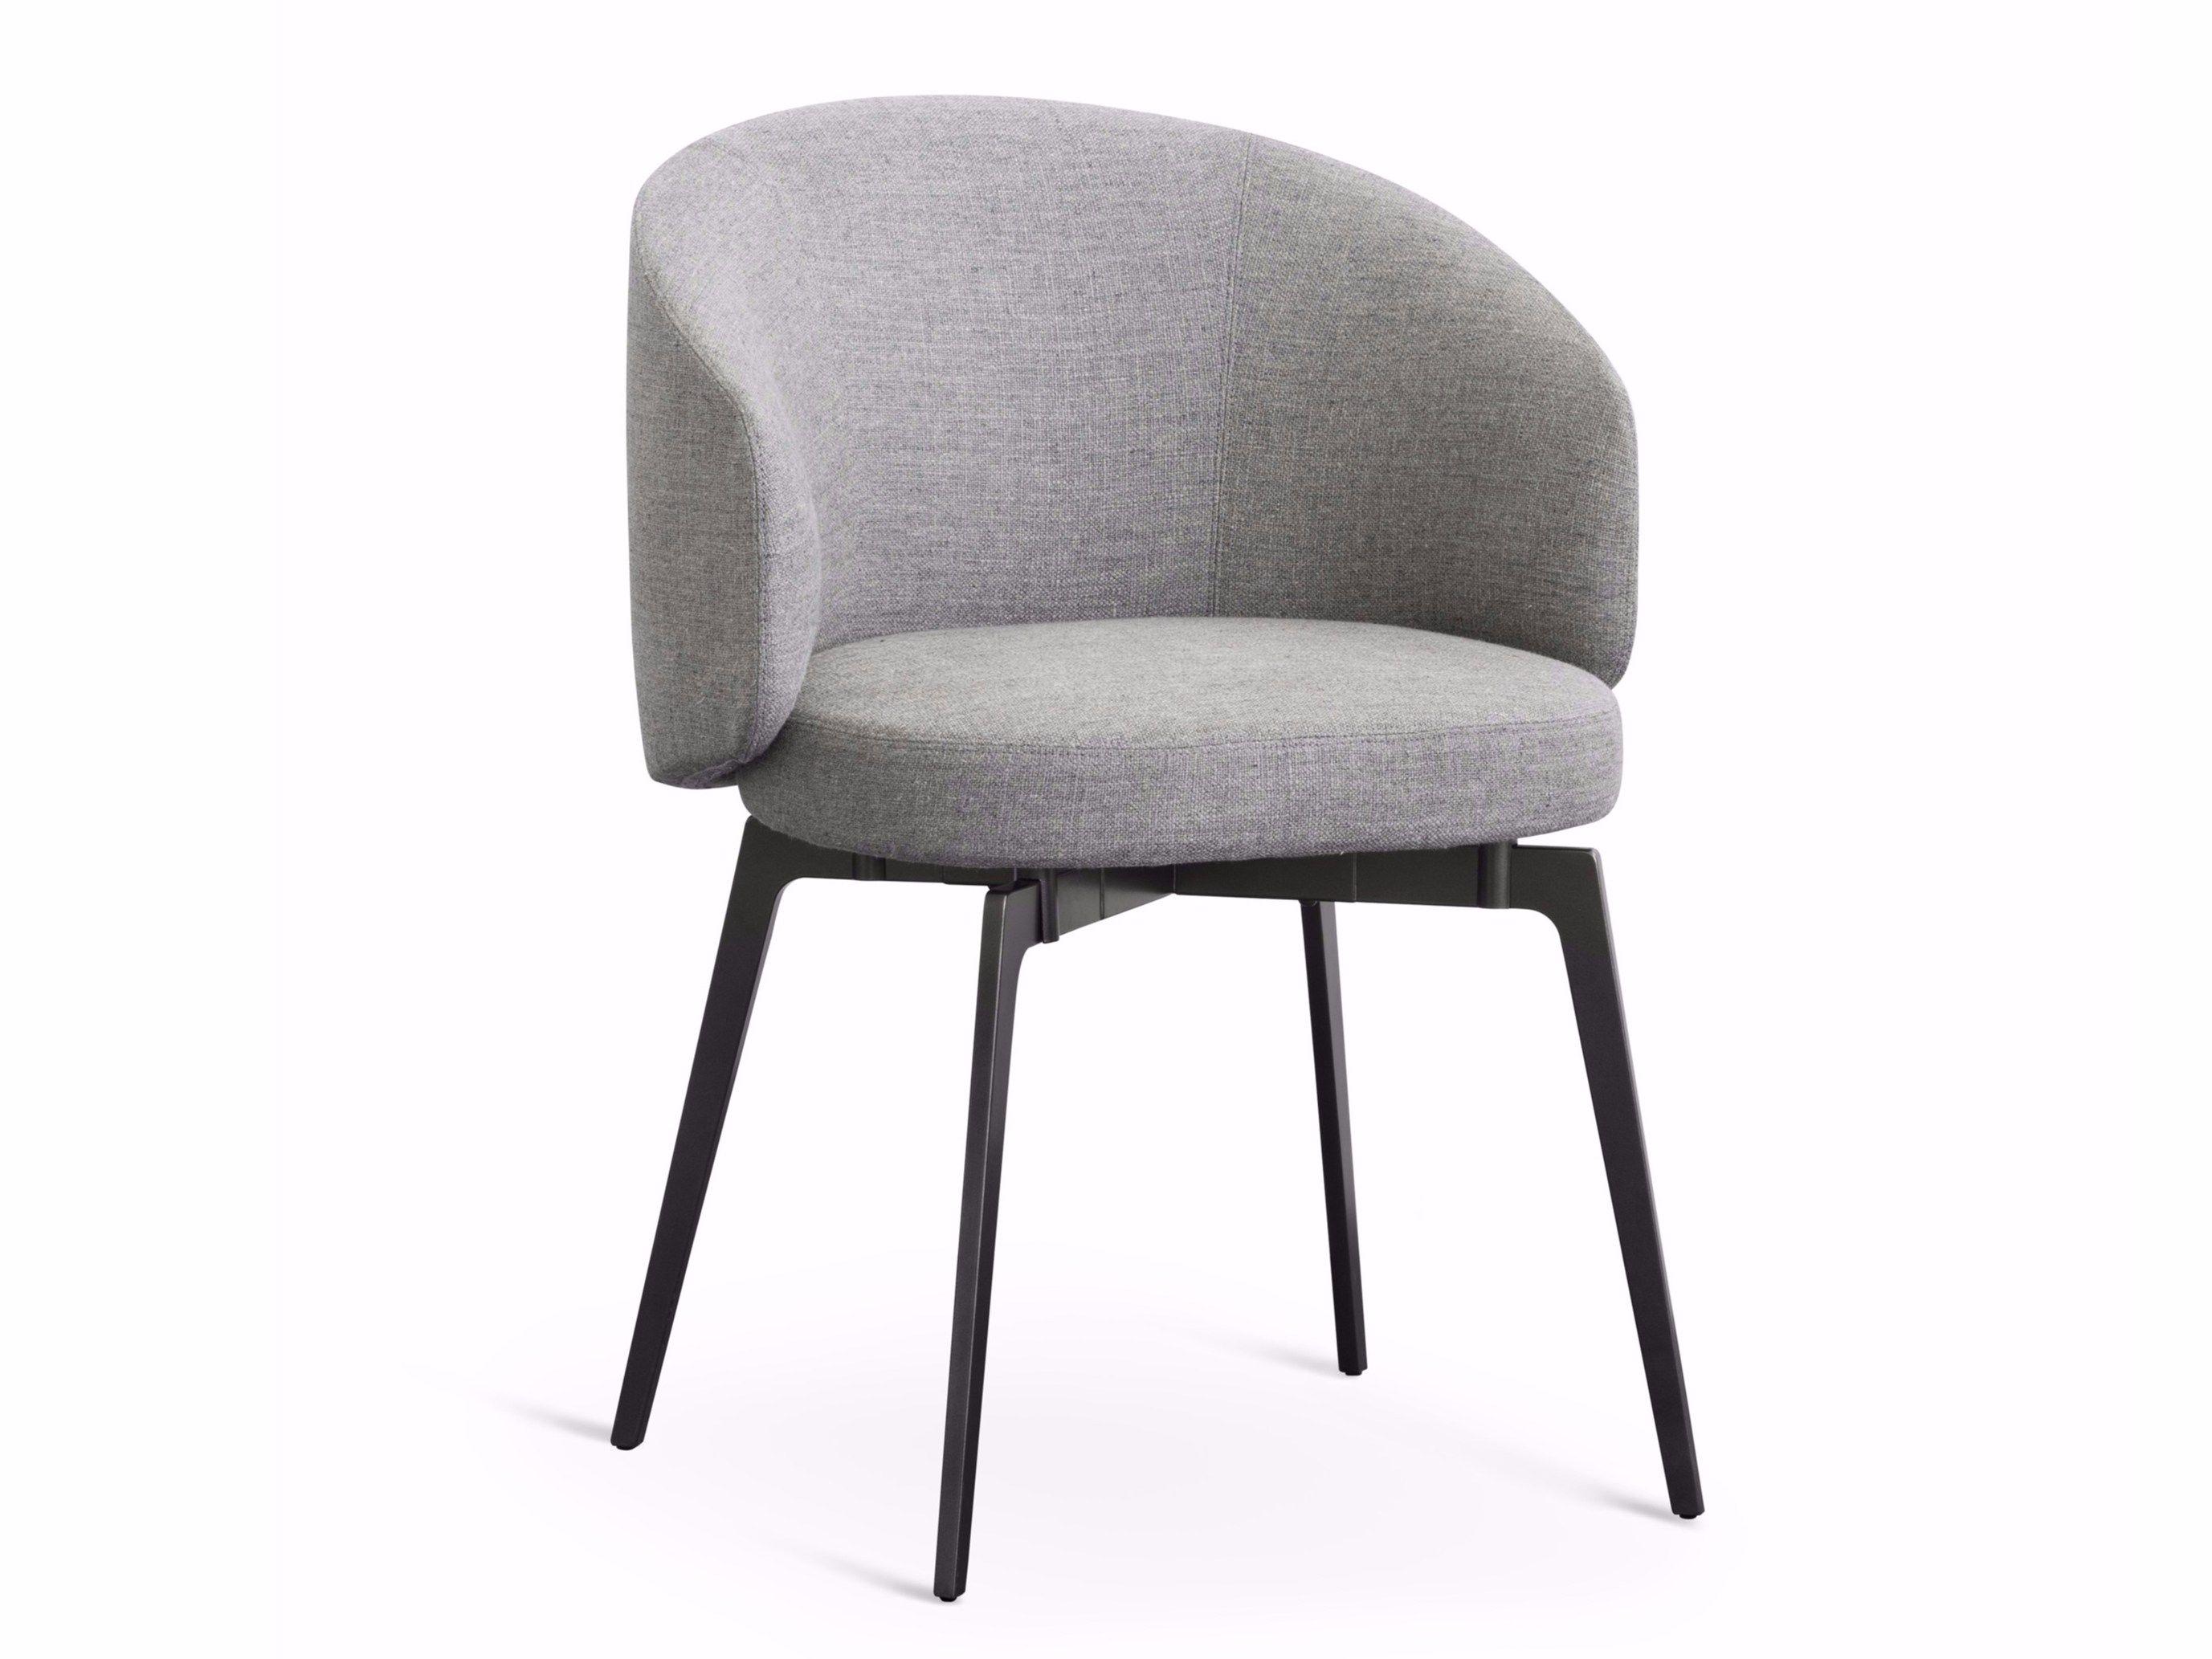 chair design restaurant humanscale diffrient world fabric easy bea by lema roberto lazzeroni 餐厅家具